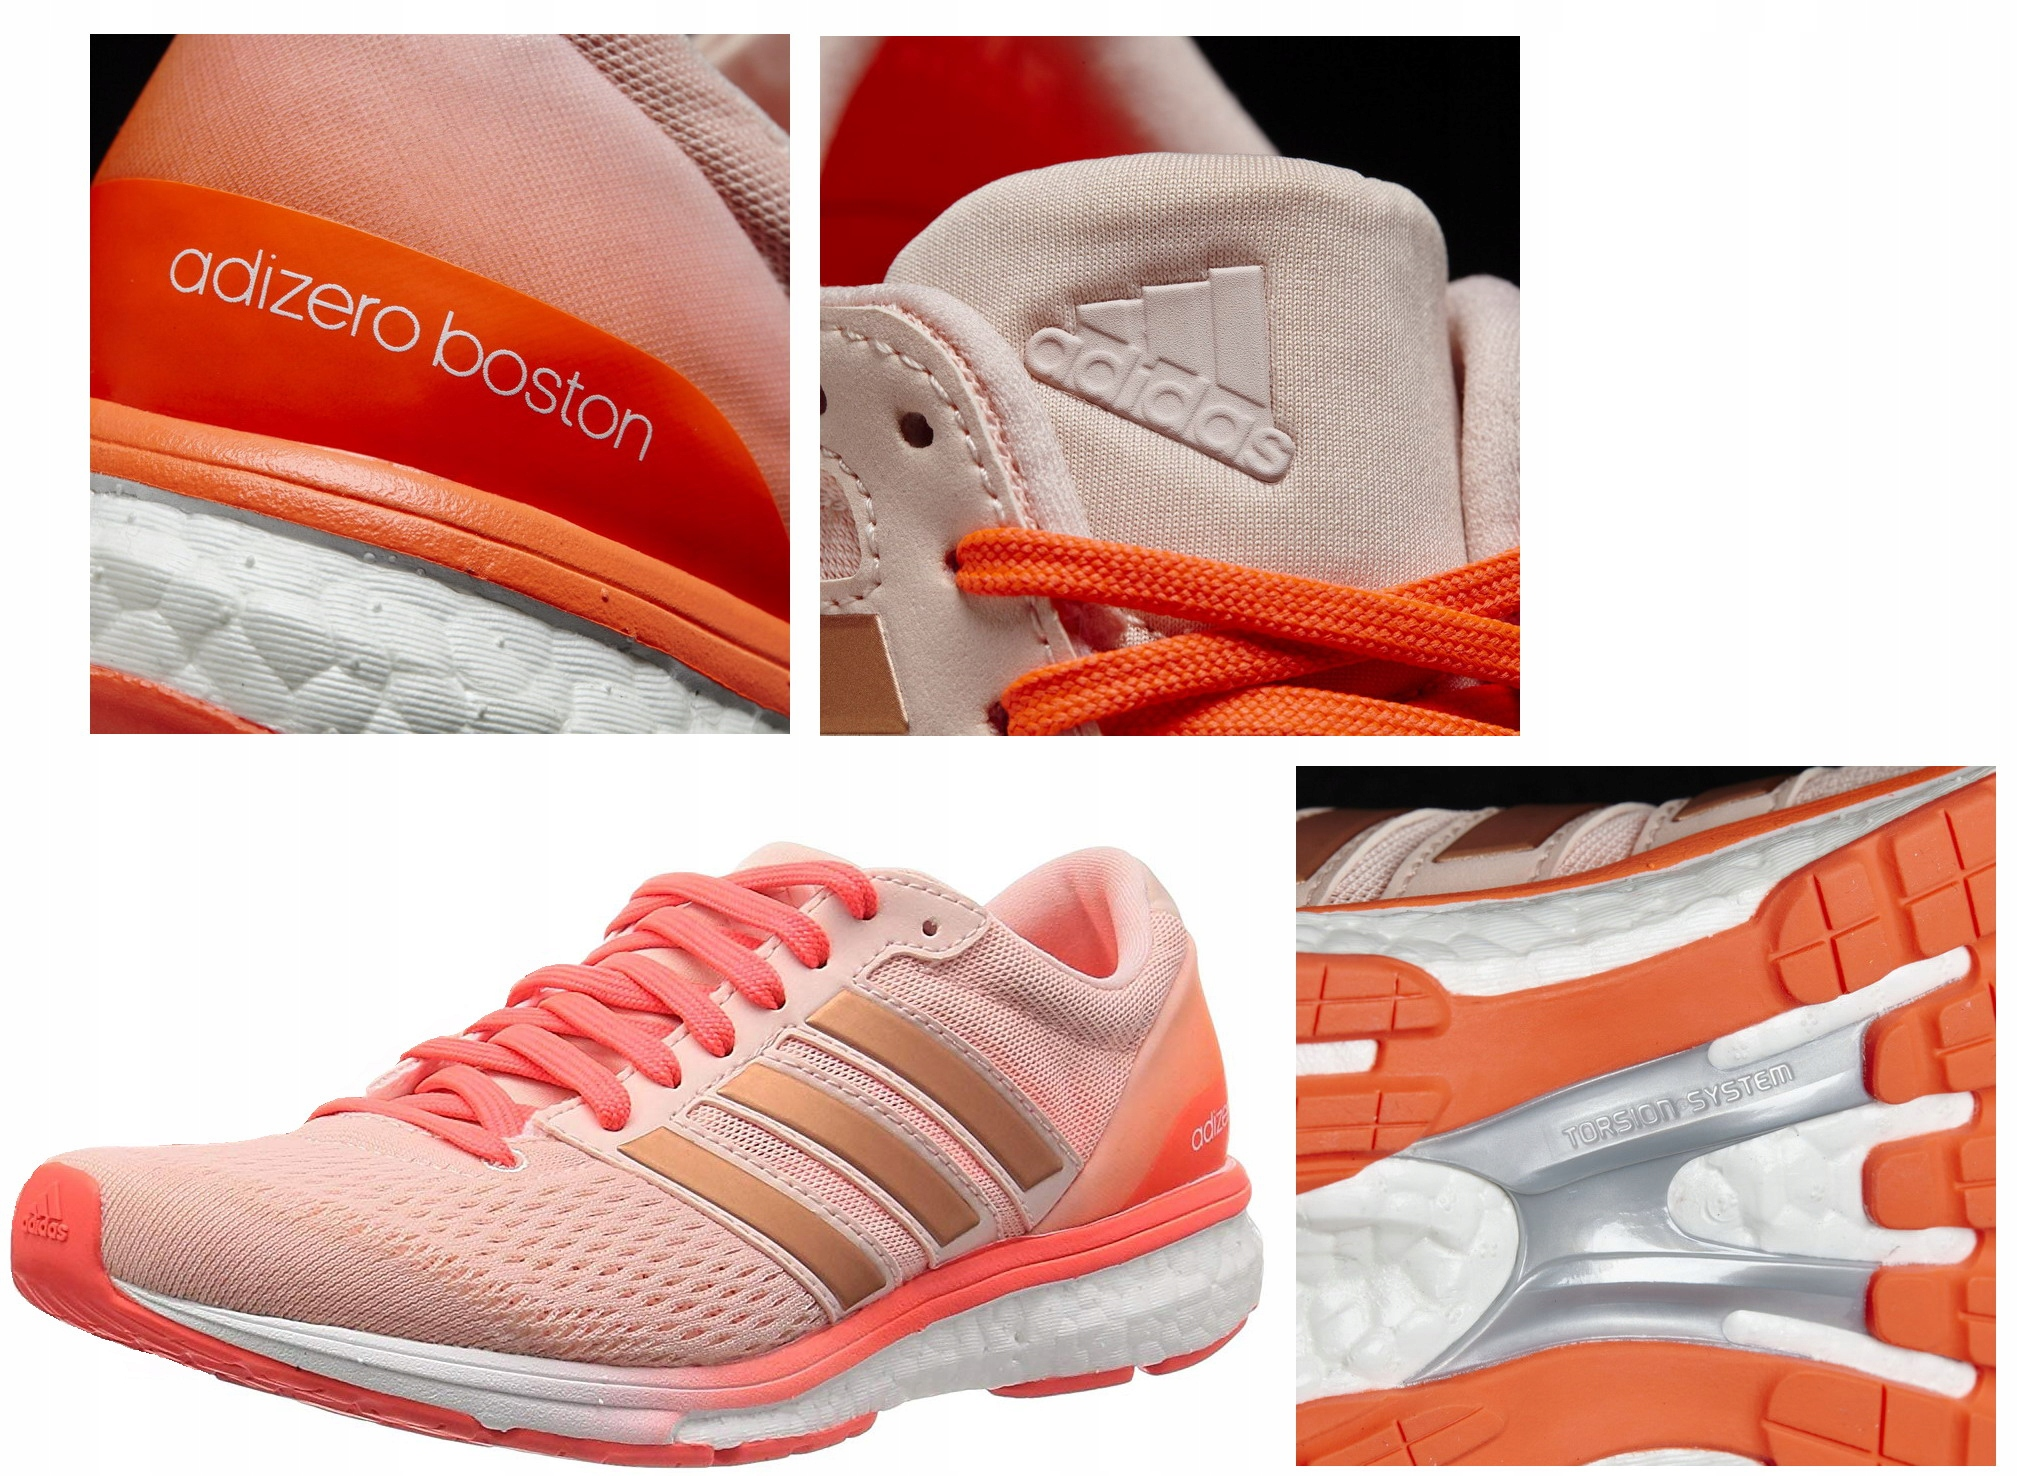 Adidas AdiZero Boston 6 buty damskie - 37 1/3